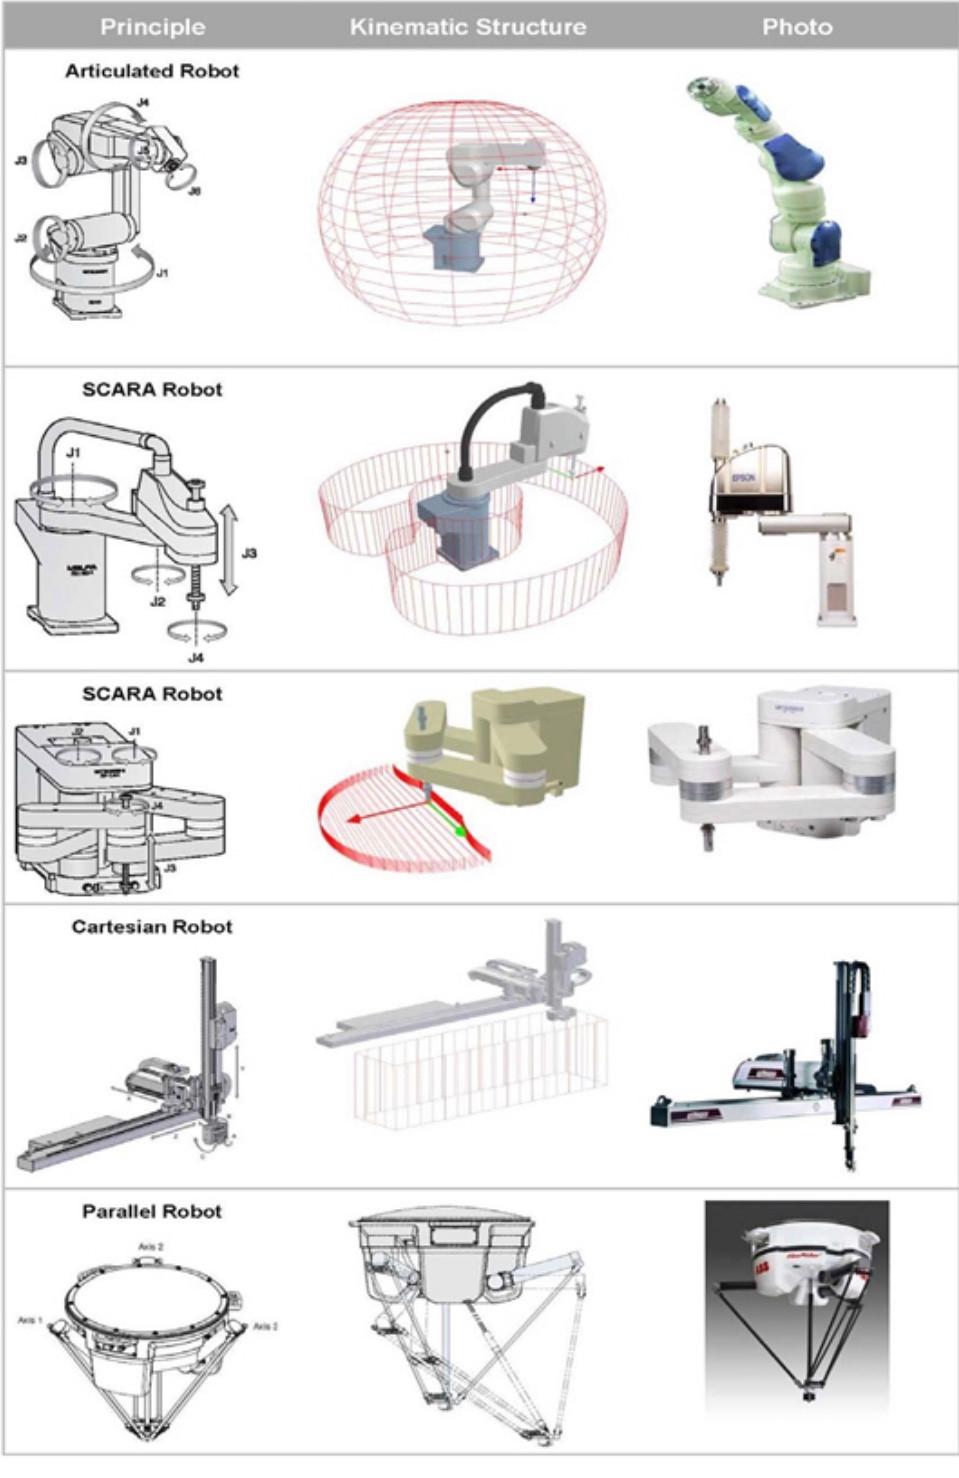 5 types of industrial robots